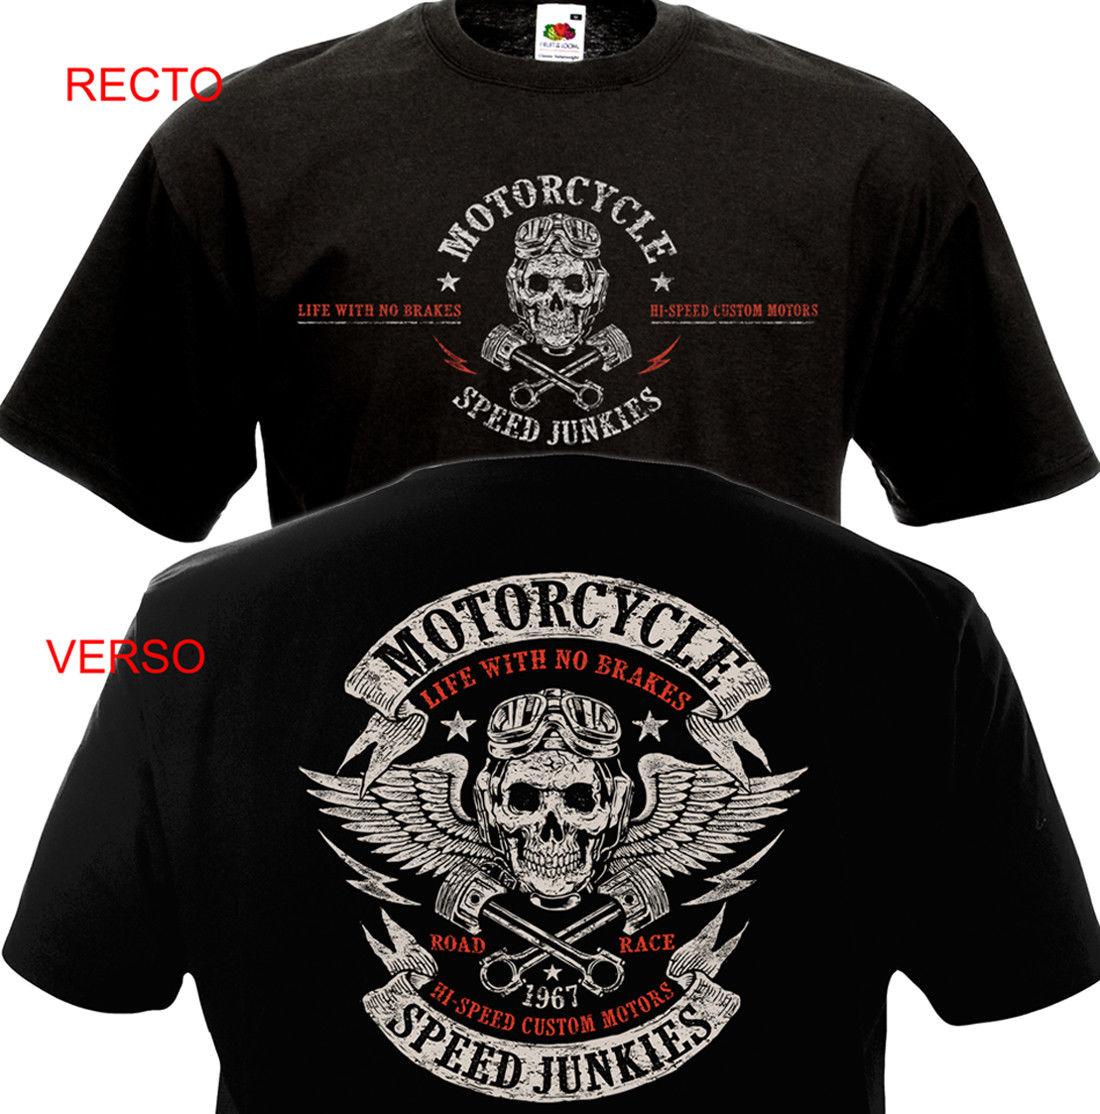 Divertida ropa pantalón corto casual manga camisetas camiseta motocicleta velocidad JUNKIES Biker Chopper Motard MC camiseta